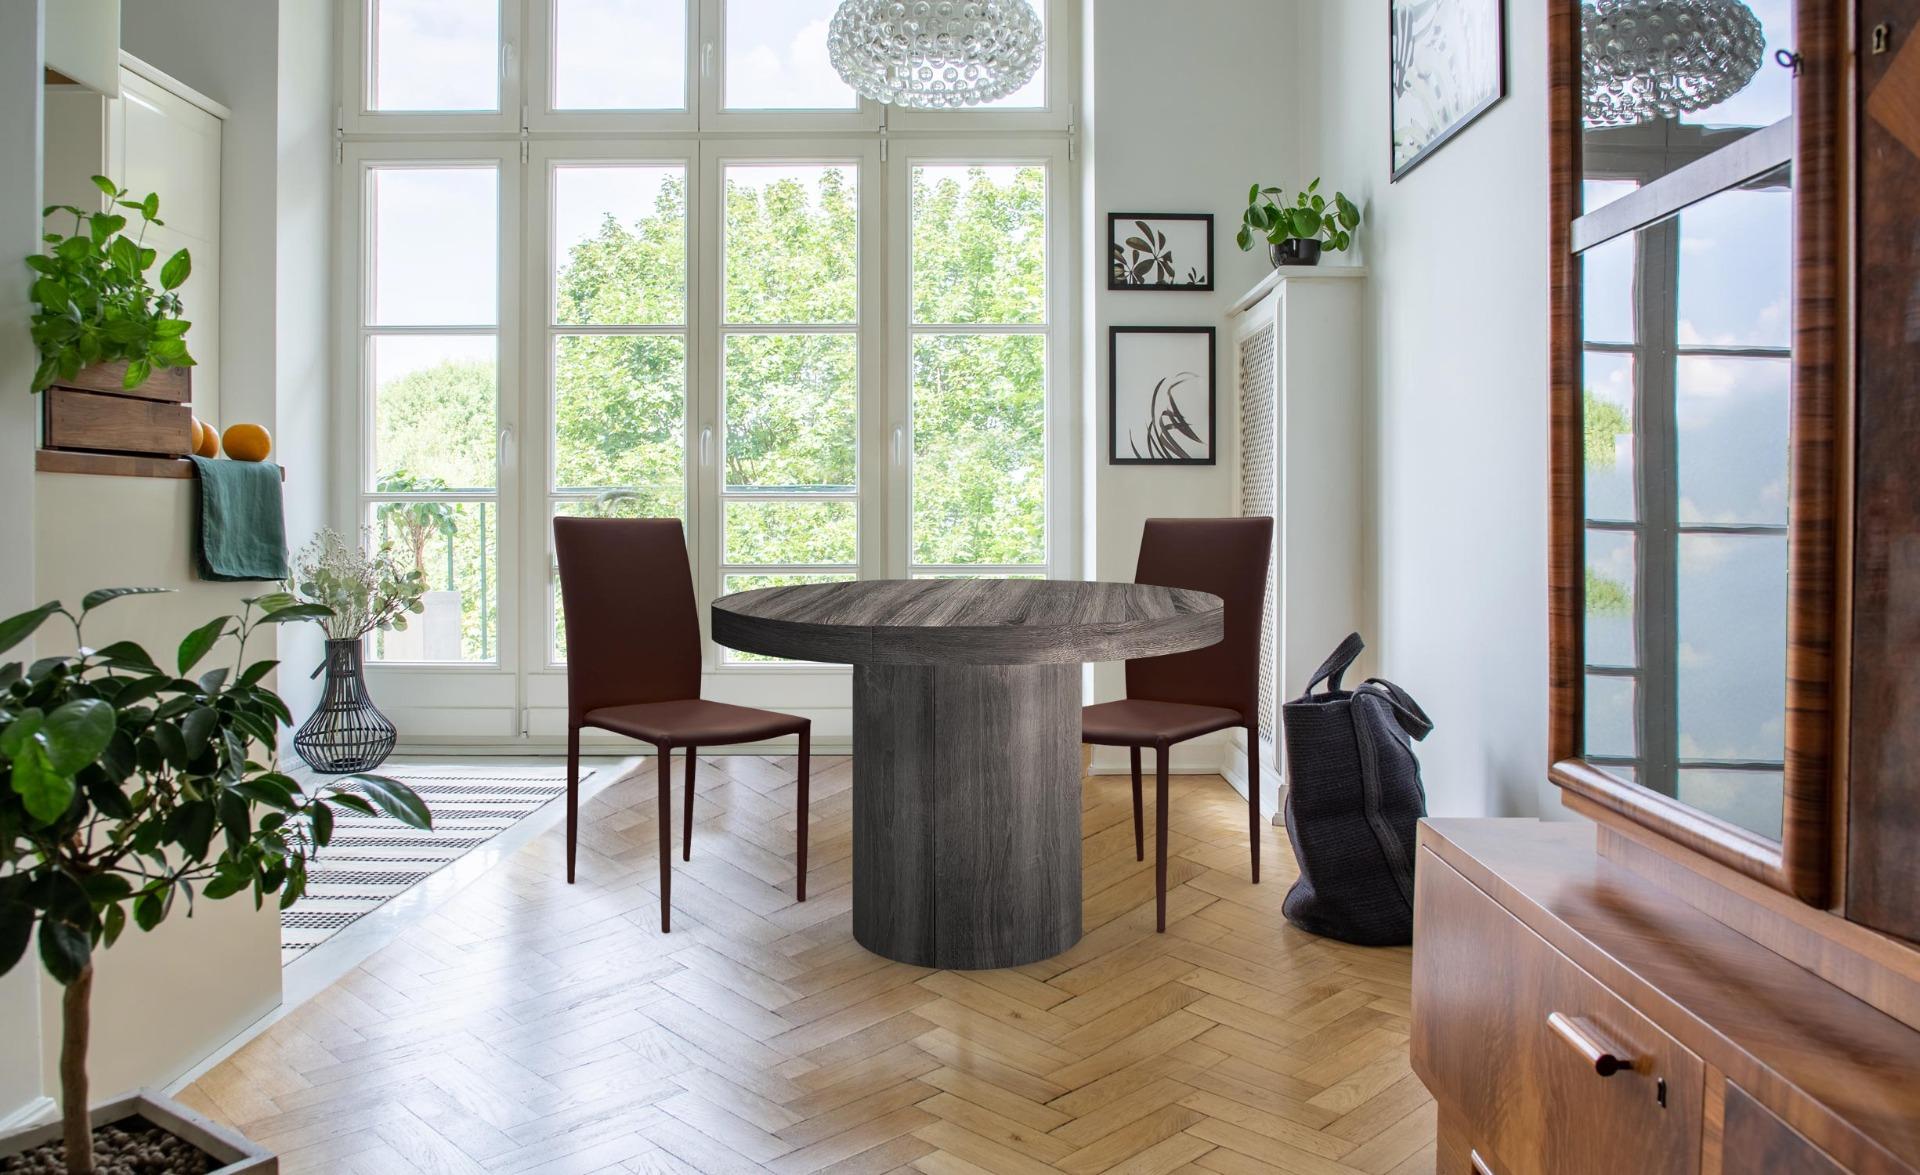 Lot de 6 chaises empilables Modan Simili (P.U) Marron